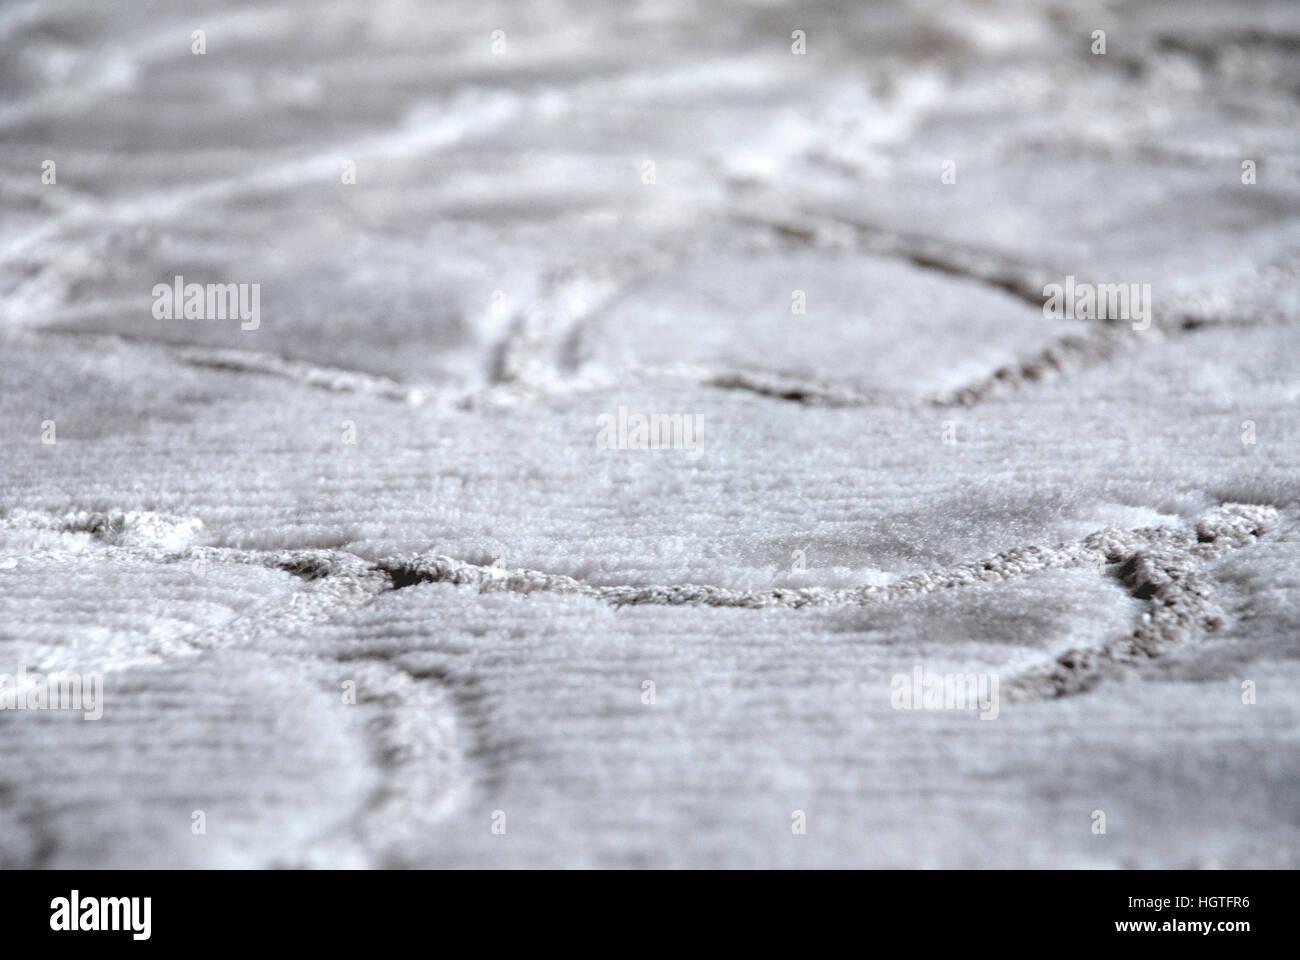 Fondos de textura gris Imagen De Stock